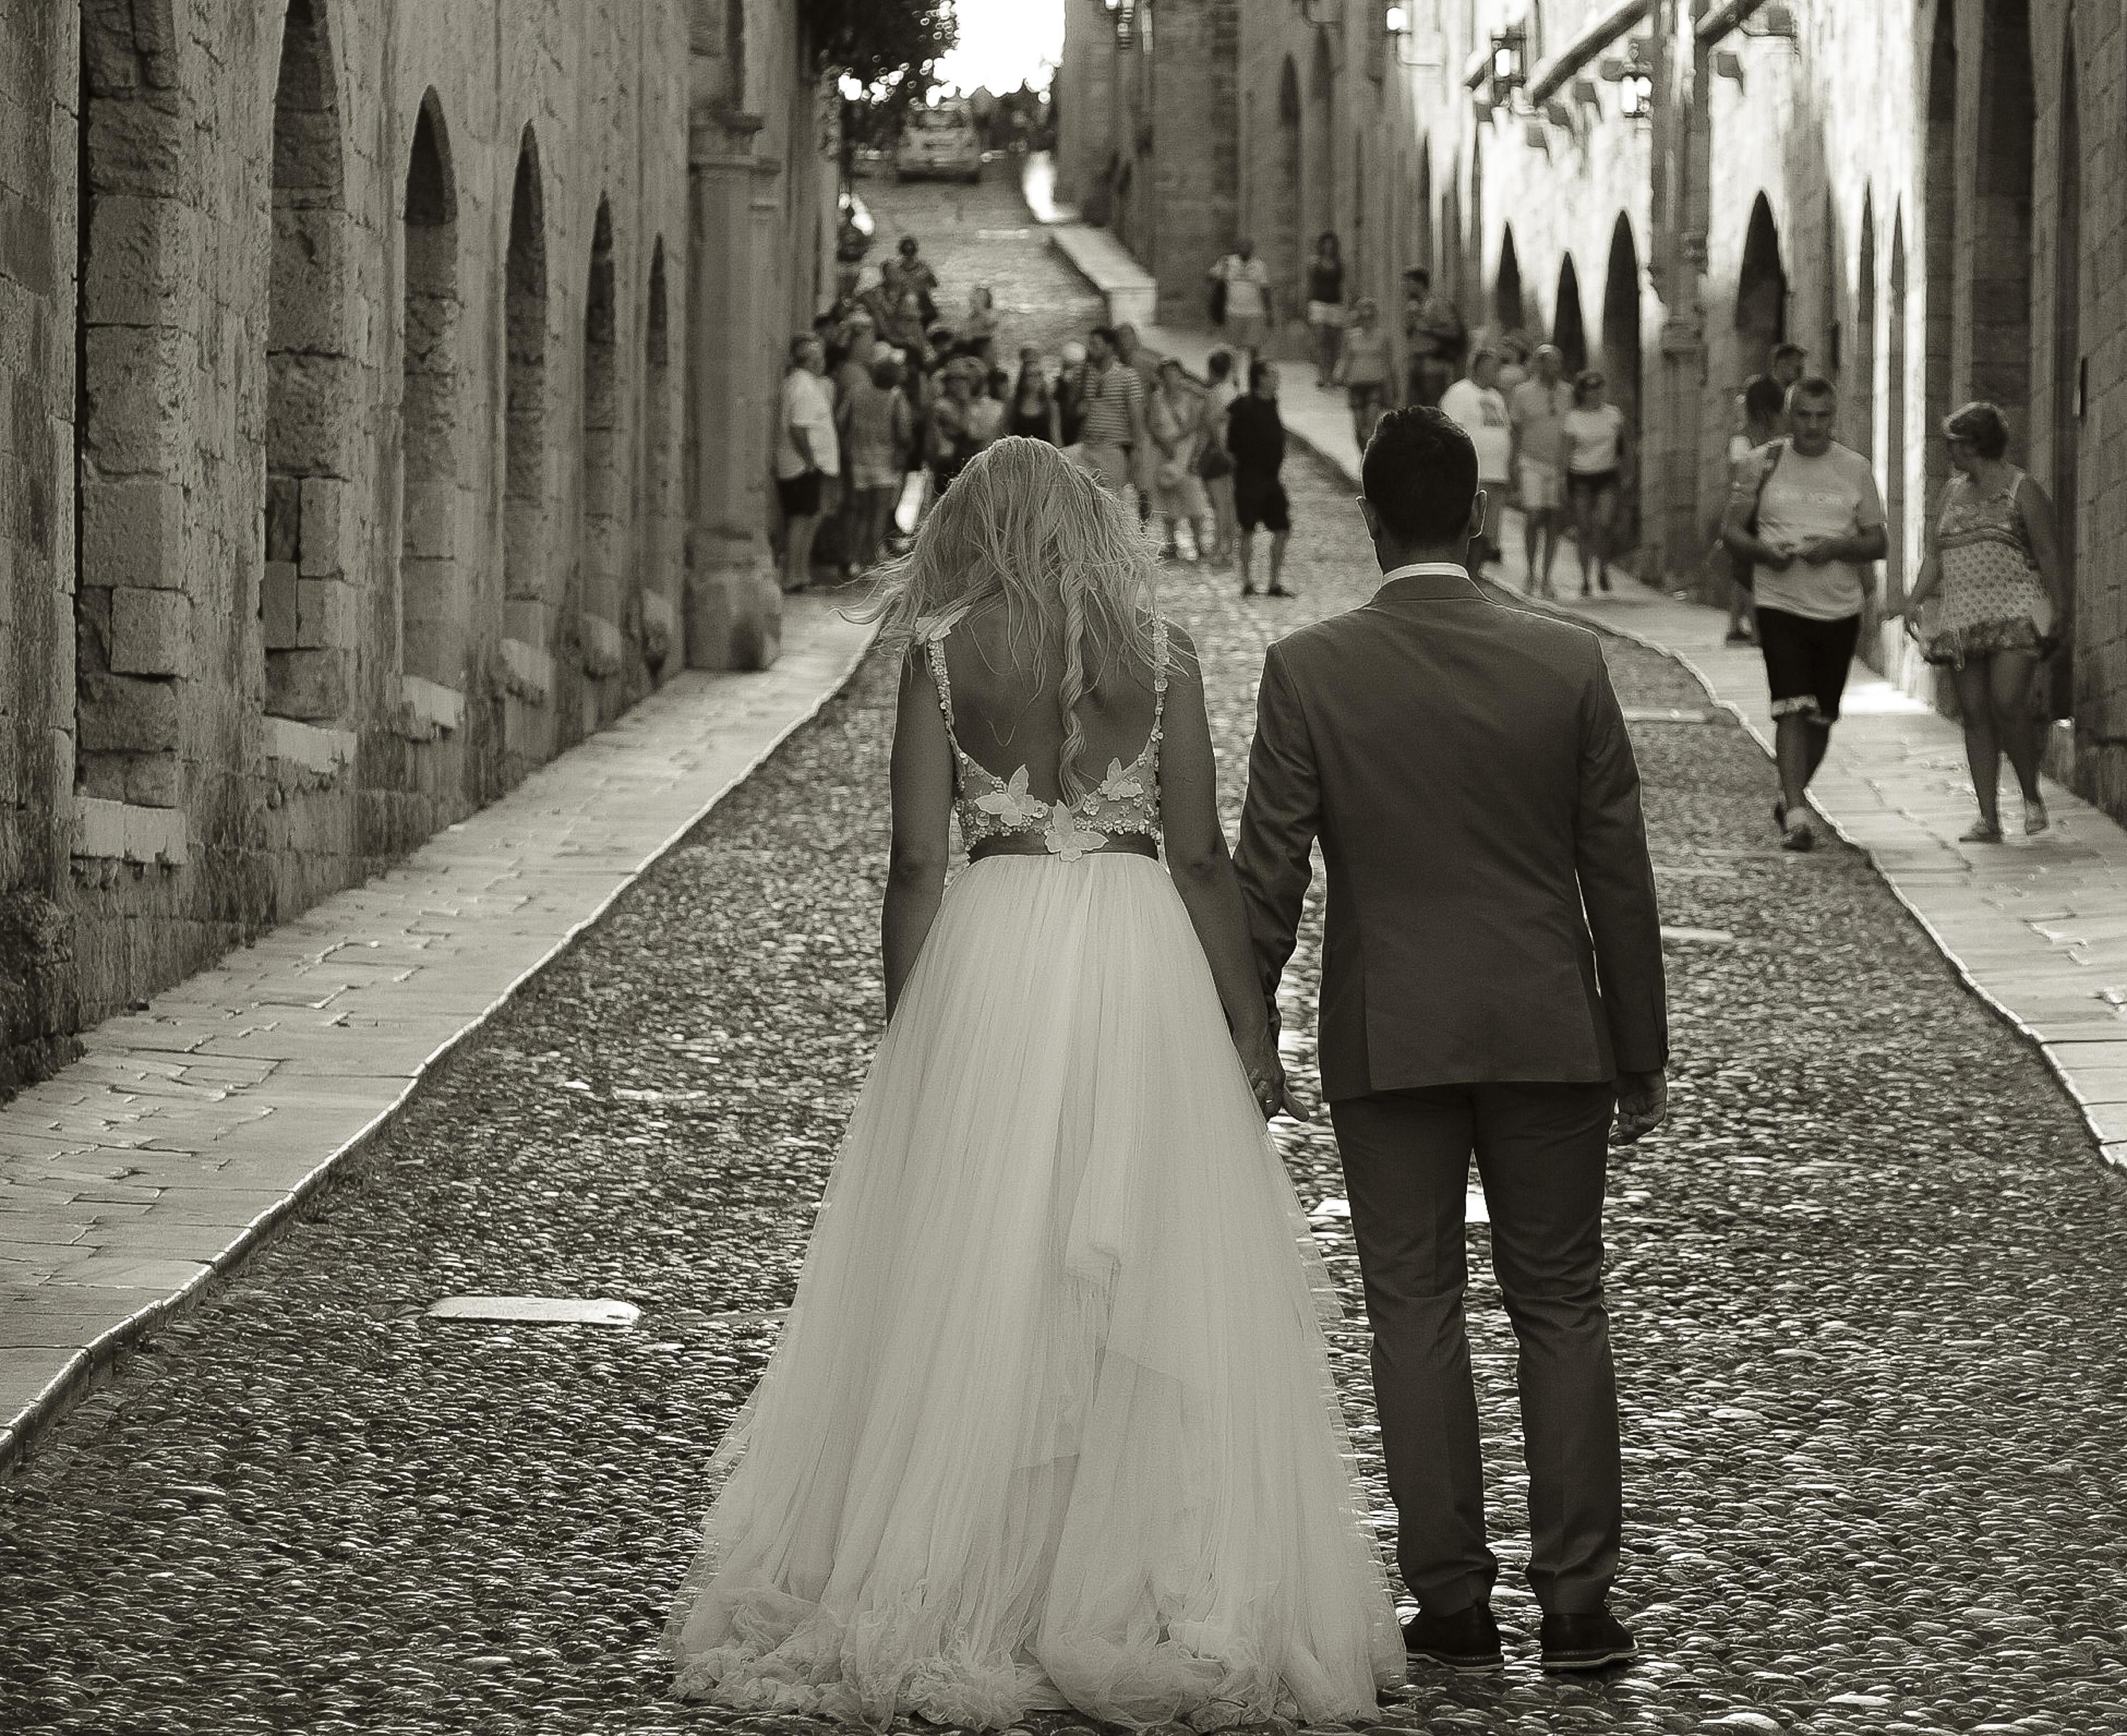 https://sleeklens.com/wp-content/uploads/2018/09/wedding-lightroom-presets-signature-bride-groom-after-7.jpg